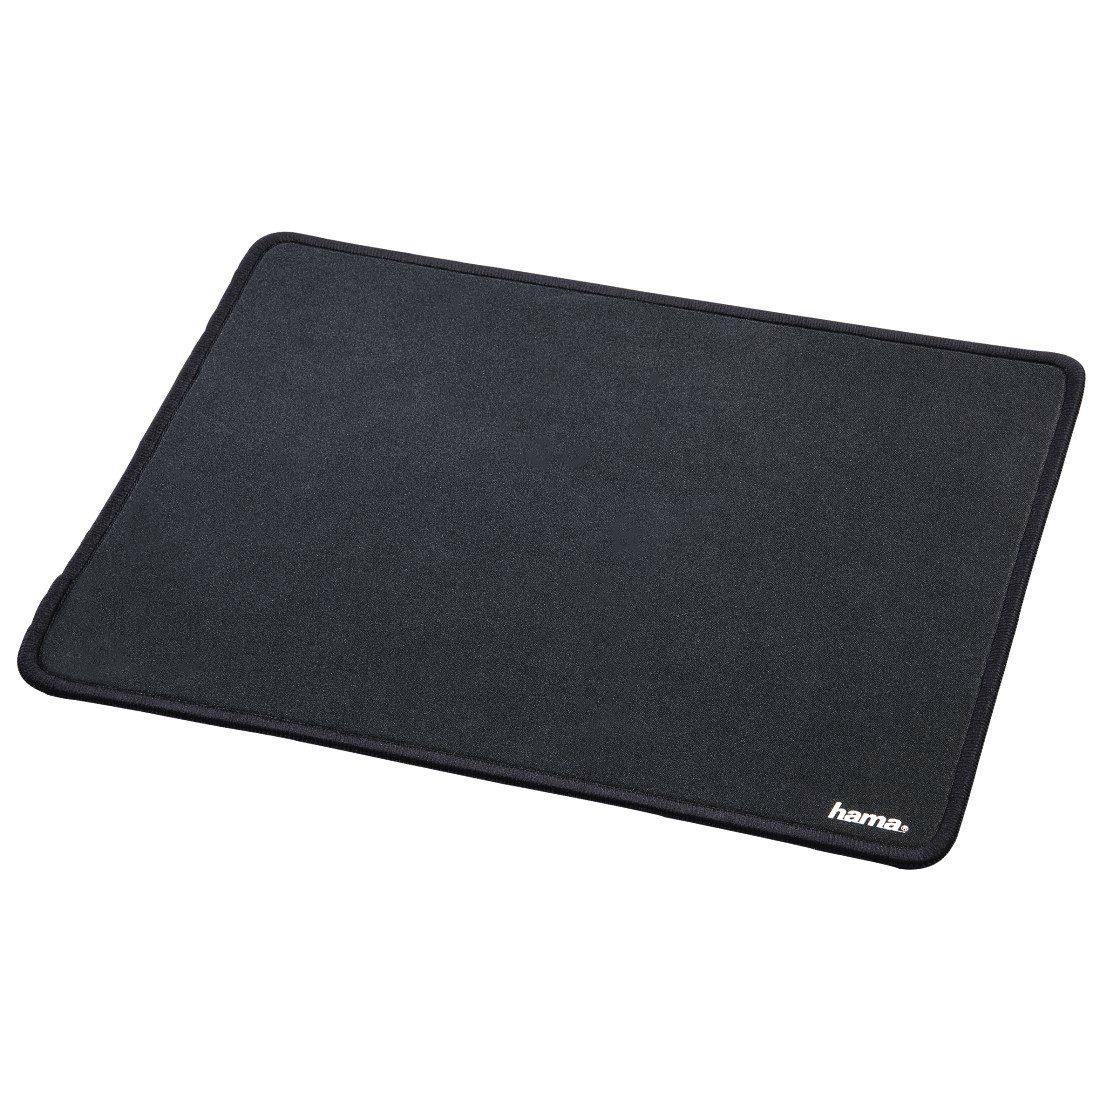 Hama Mauspad Mousepad extra groß DIN A4 Format für optische »Maus u. Lasermaus rutschfest«